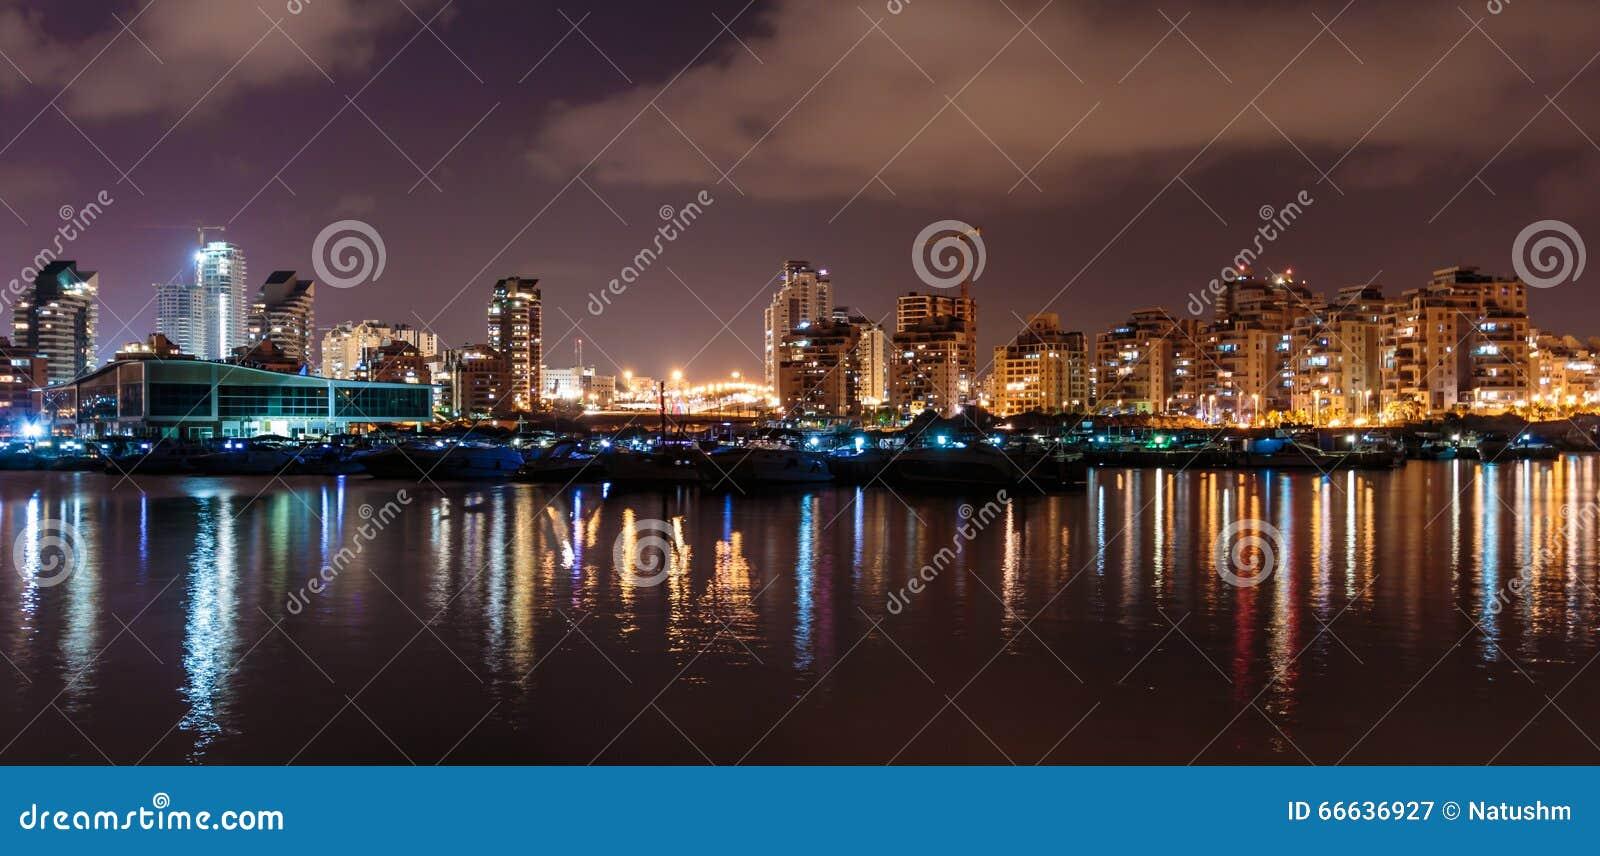 Ashdod Marina: Lights Are Reflected On The Sea, Ashdod Marina At Night